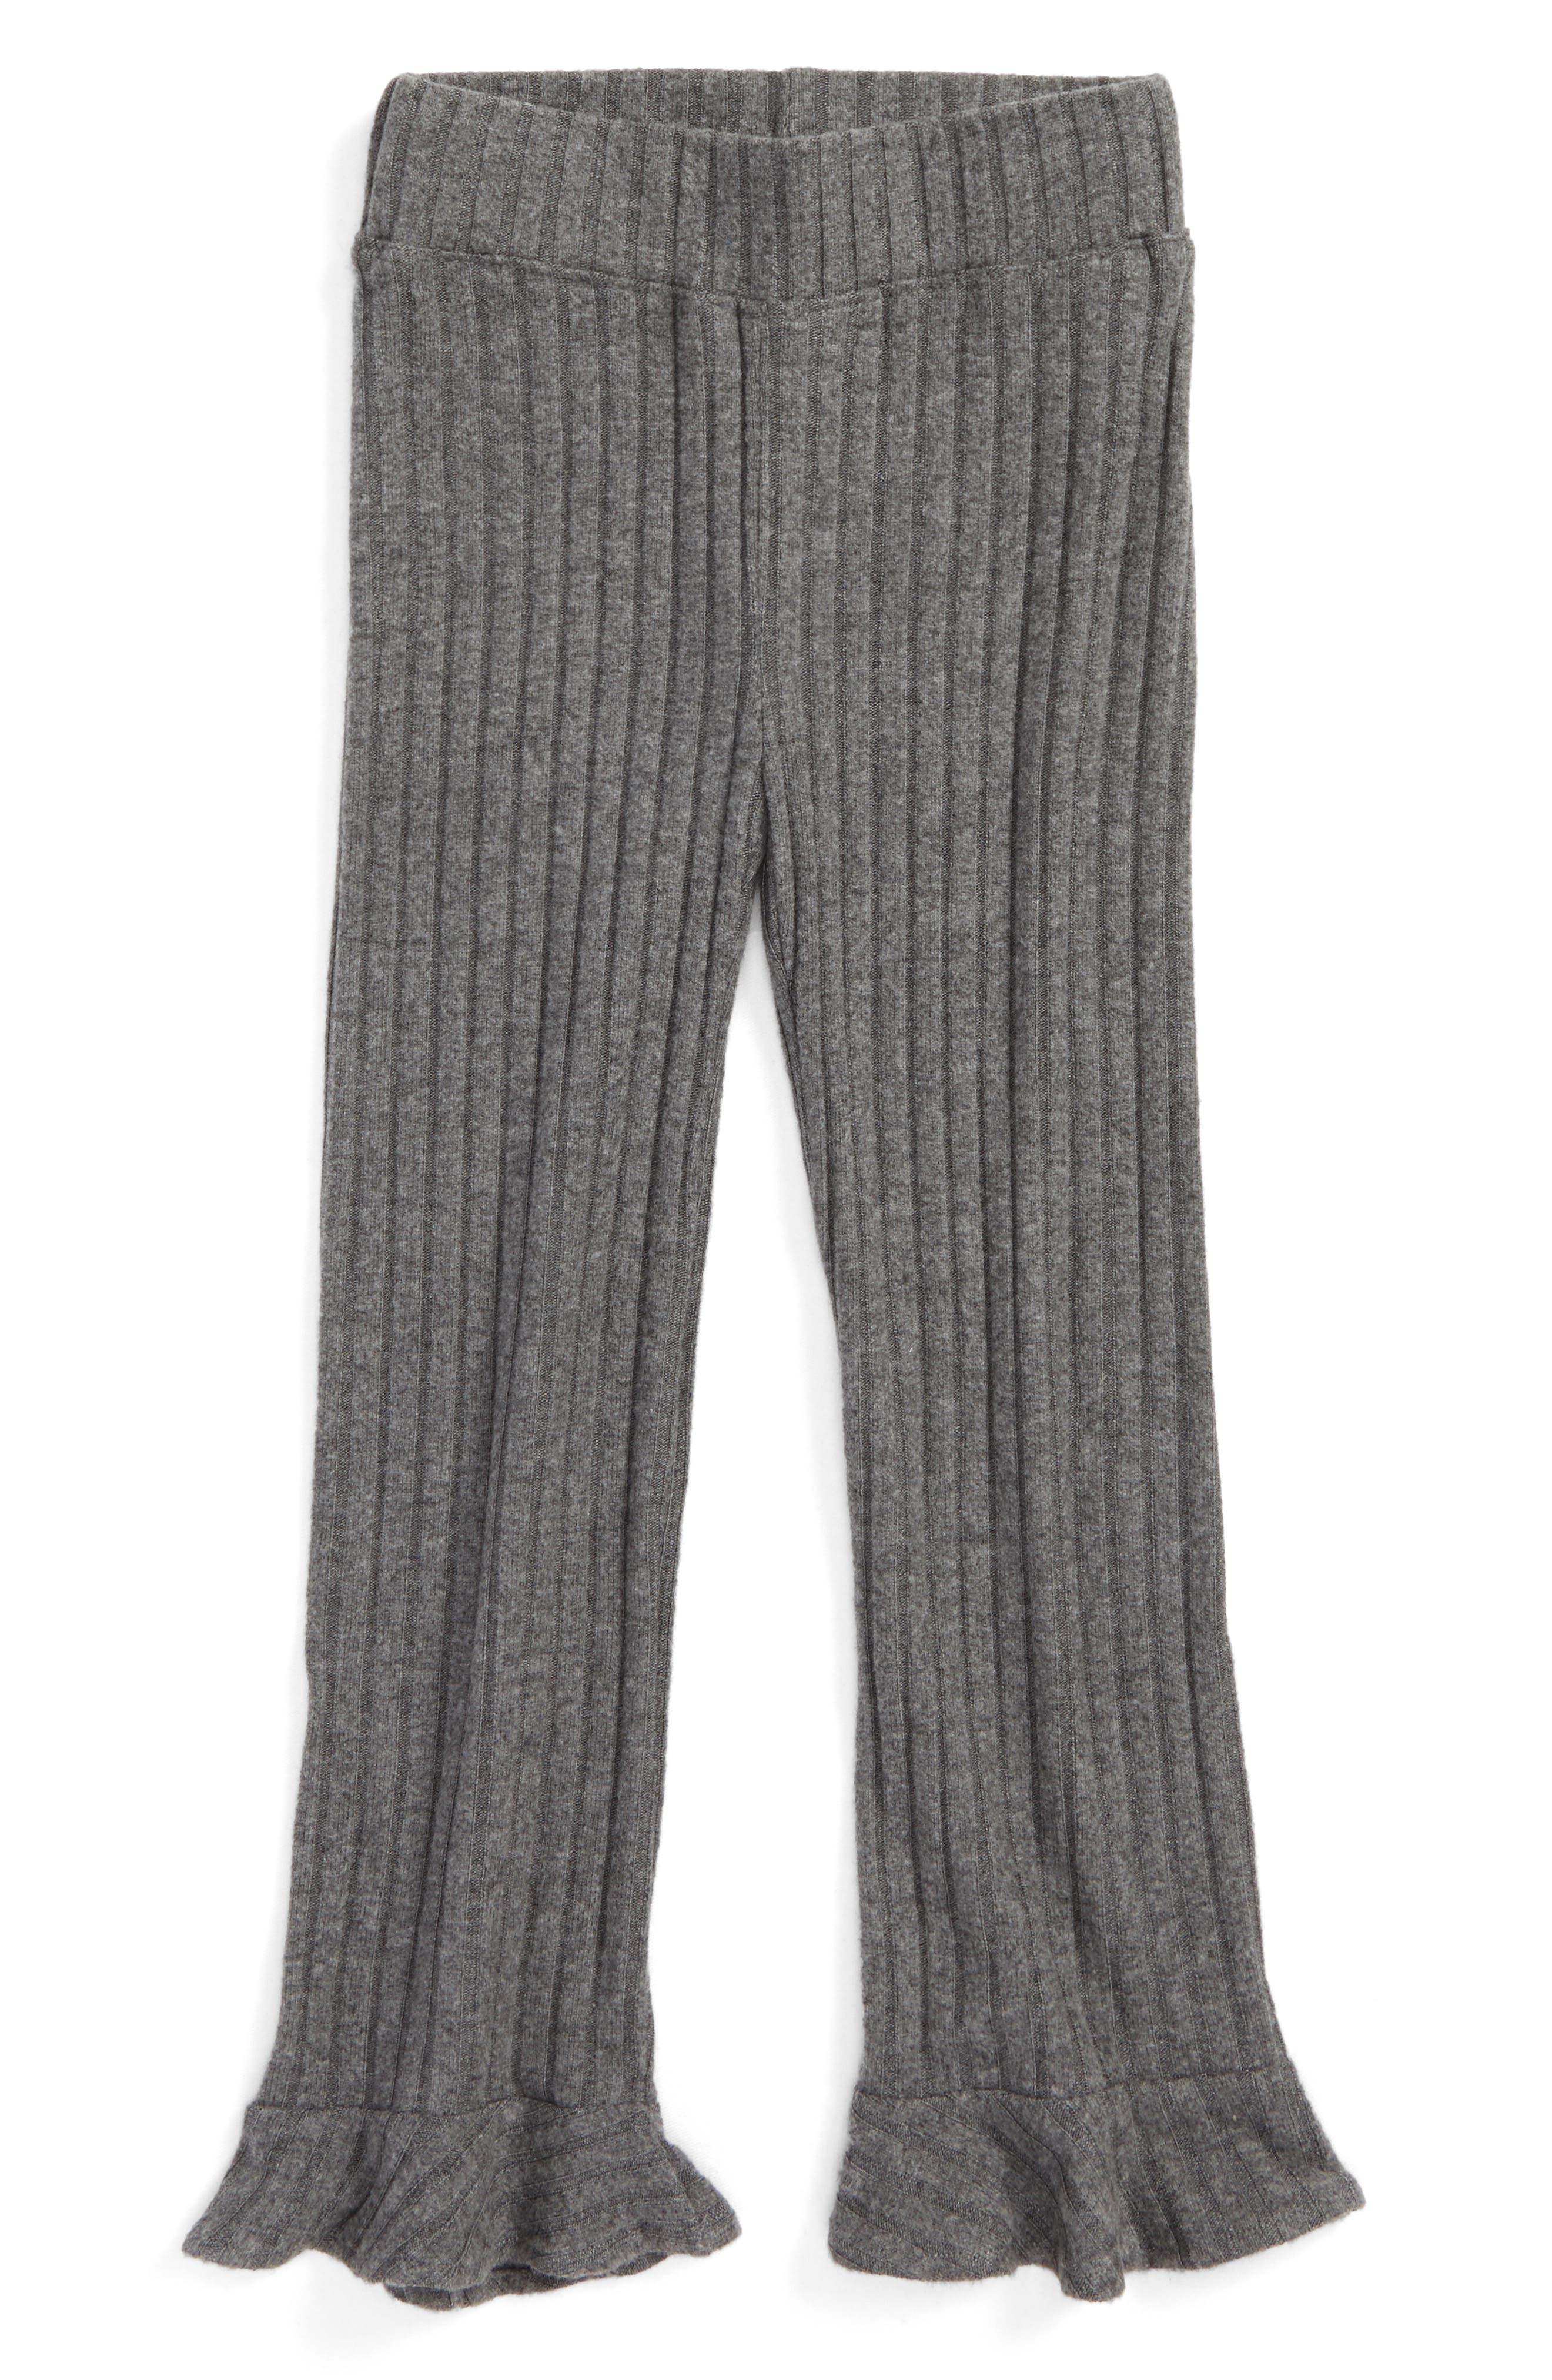 Penny Organic Cotton Flared Ruffle Pants,                         Main,                         color, 020